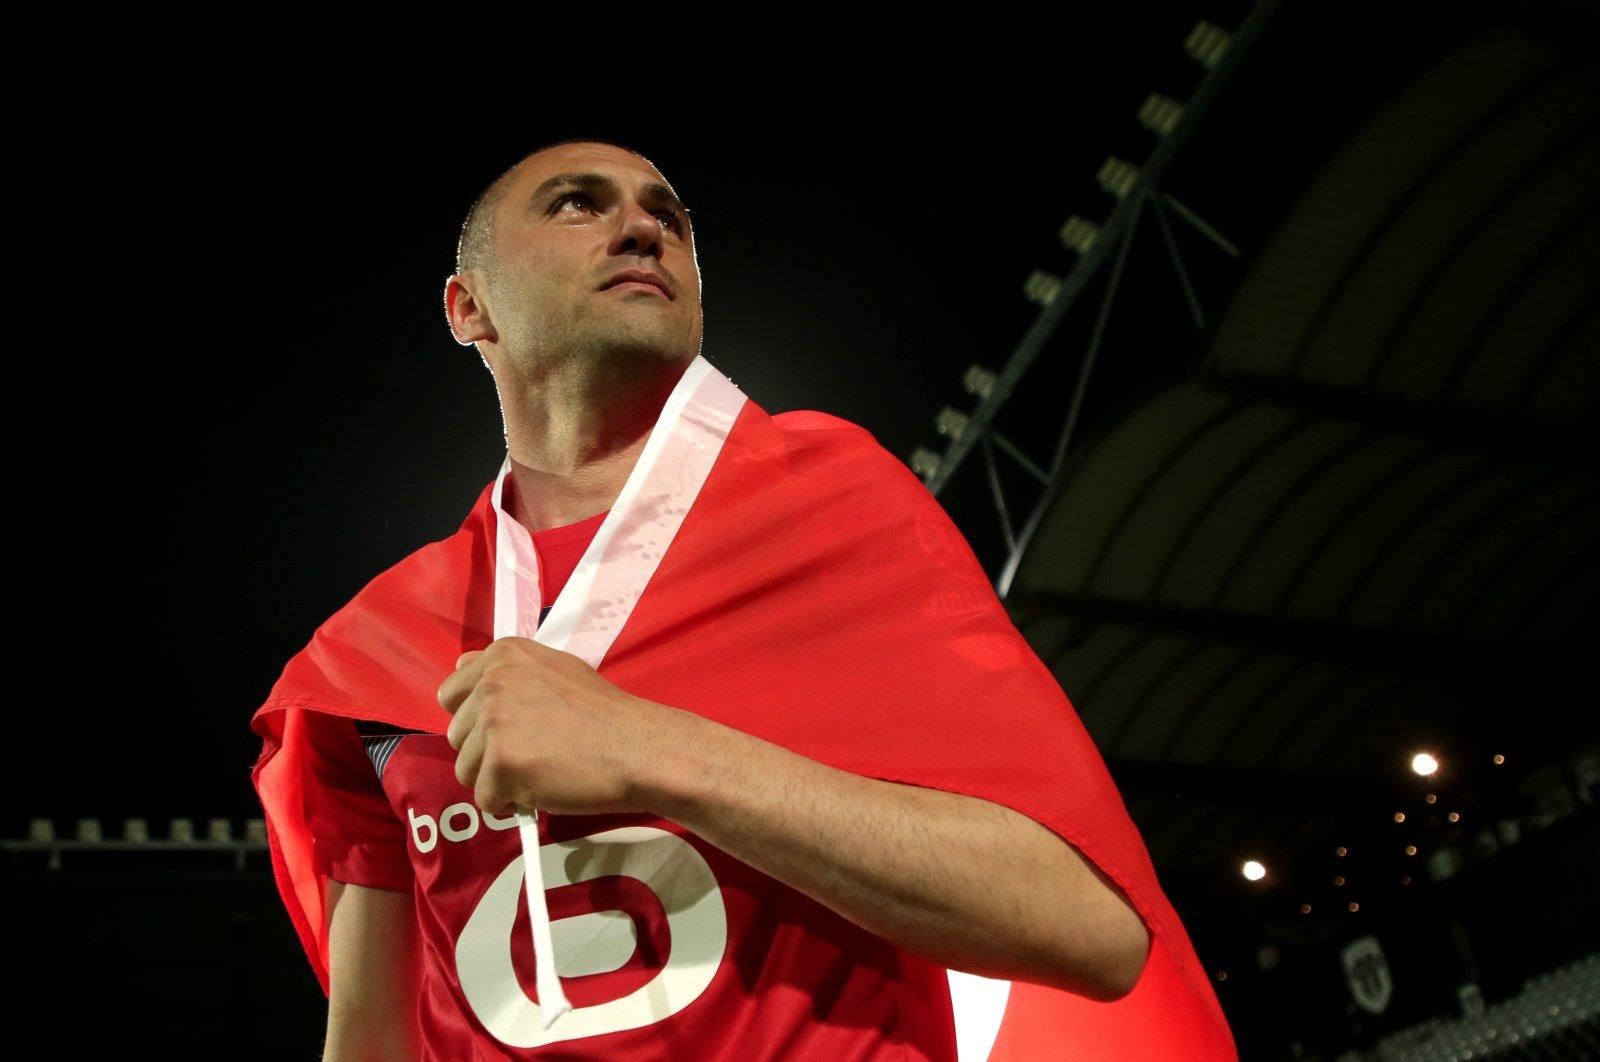 Lille's veteran Turkish forward Burak Yılmaz celebrates winning the French Ligue 1 title, Angers, France, May 23, 2021. (EPA Photo)